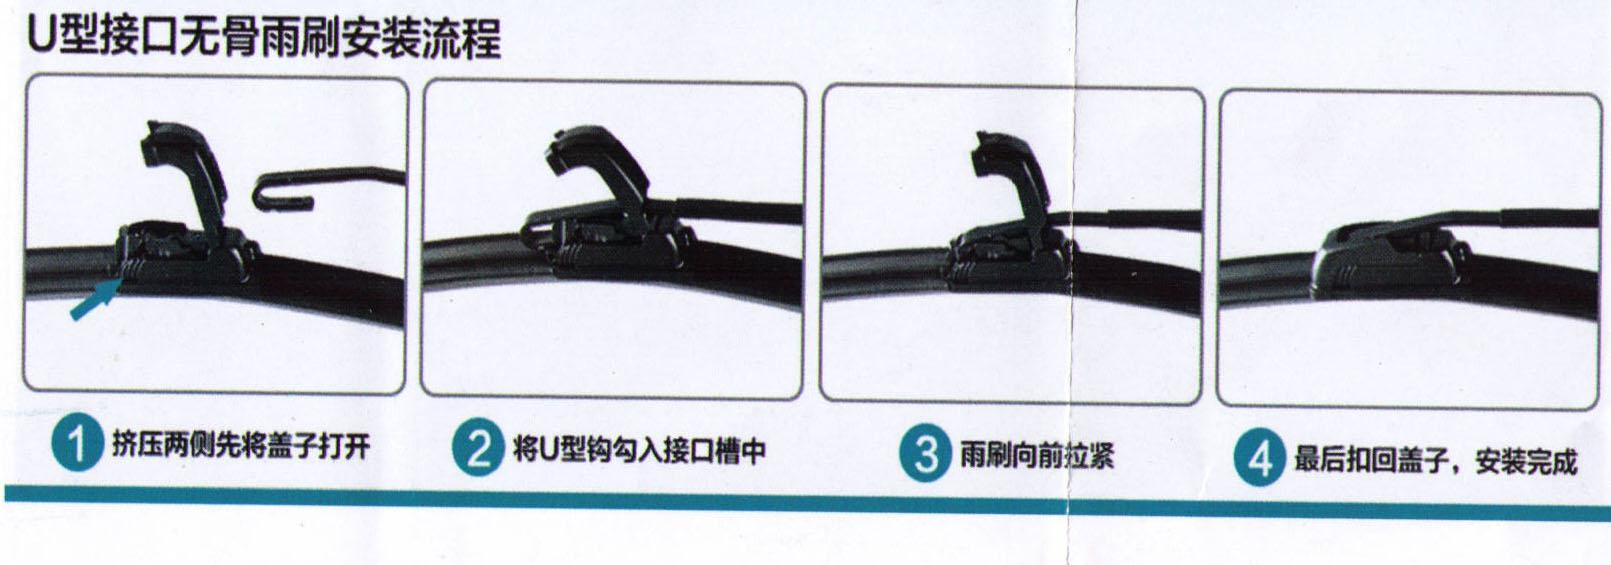 U型接口无骨雨刷安装流程.jpg